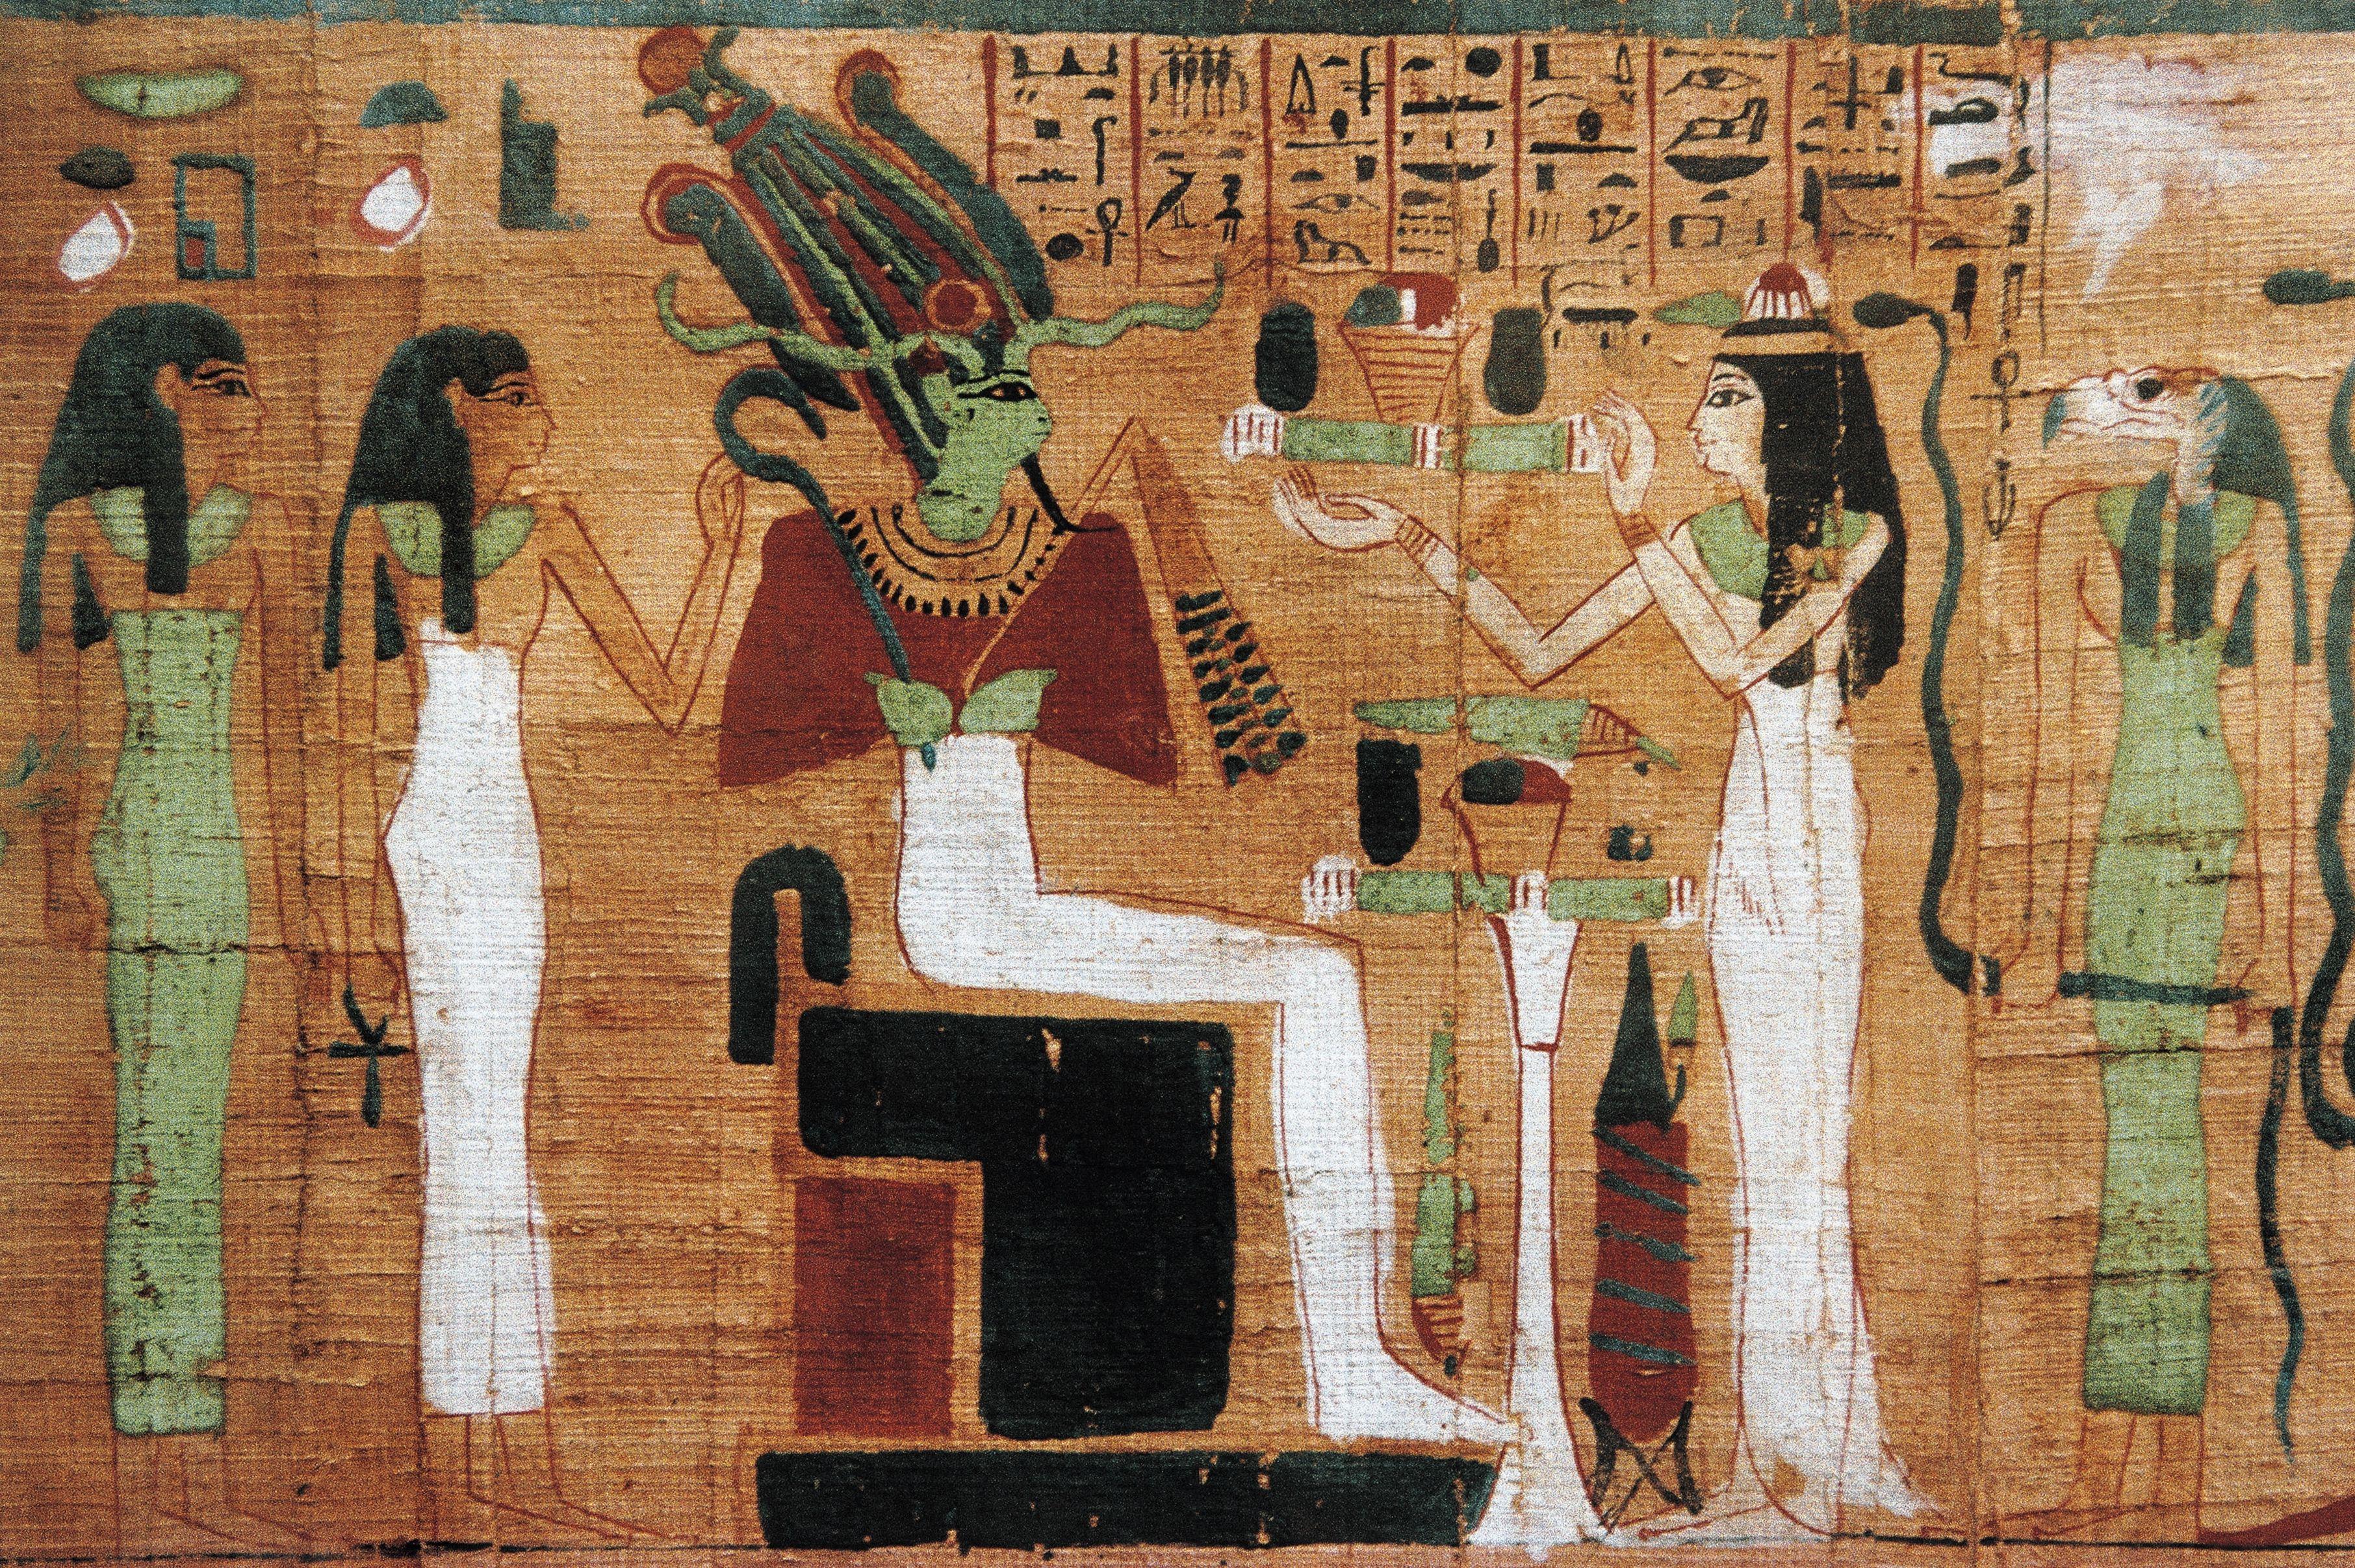 Painting of Osiris on his throne.